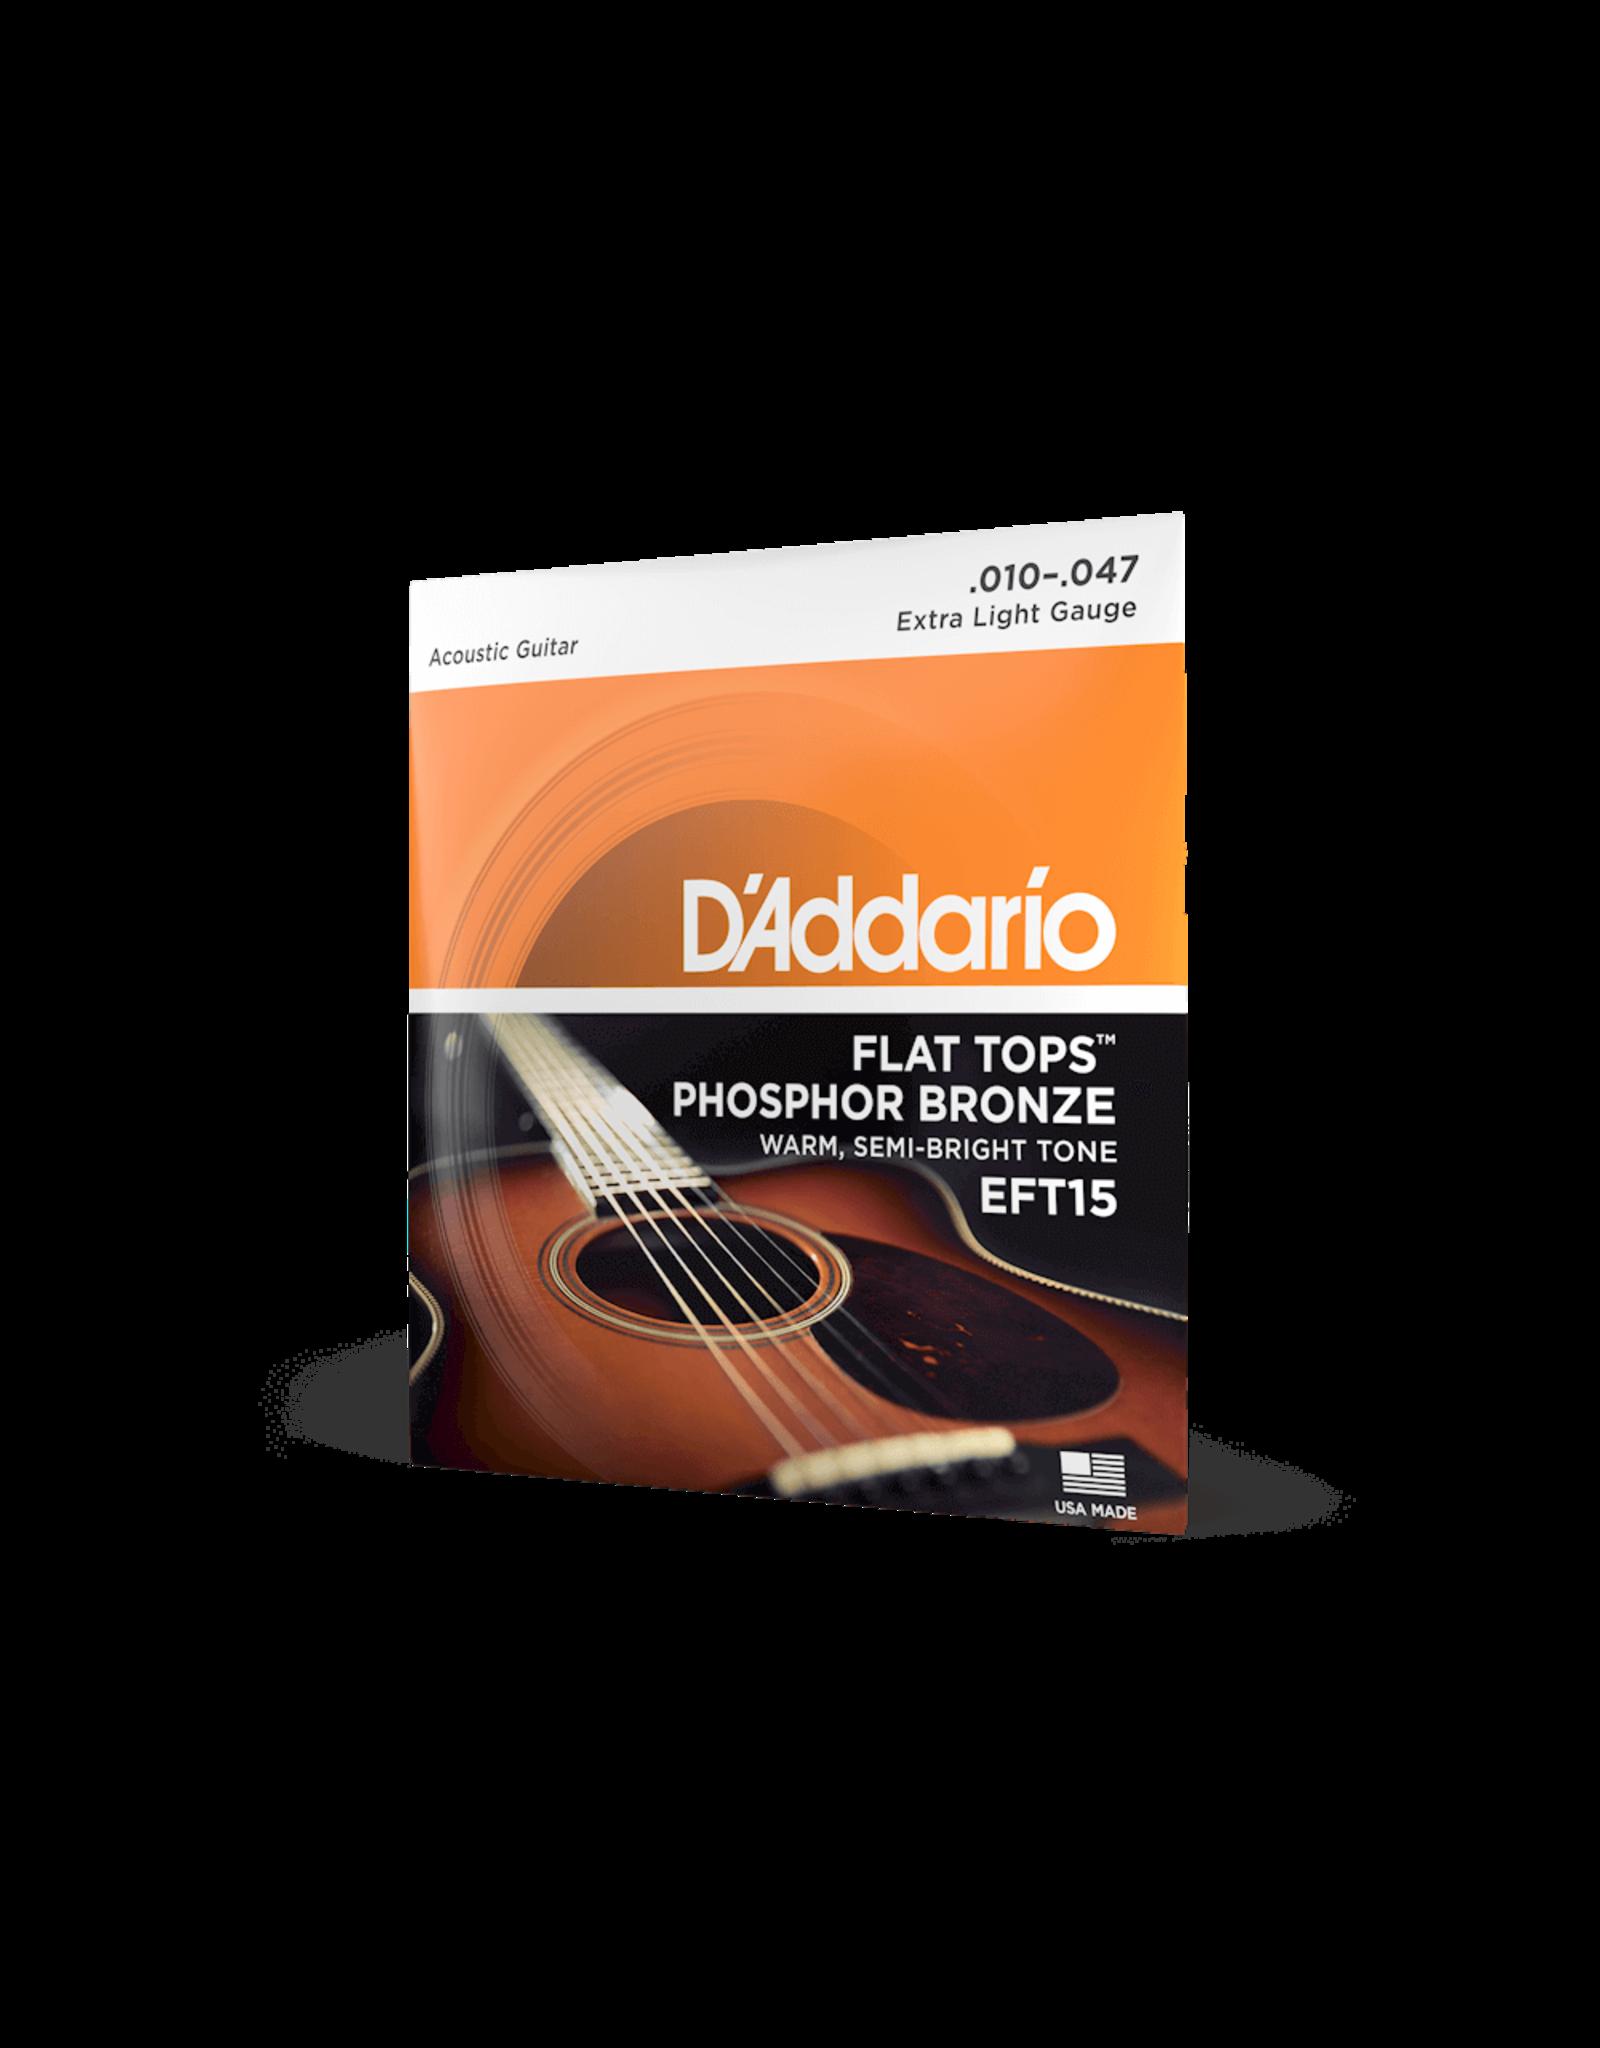 D'Addario D'Addario EFT15 Flat Tops Phosphor Bronze Acoustic - 10-47